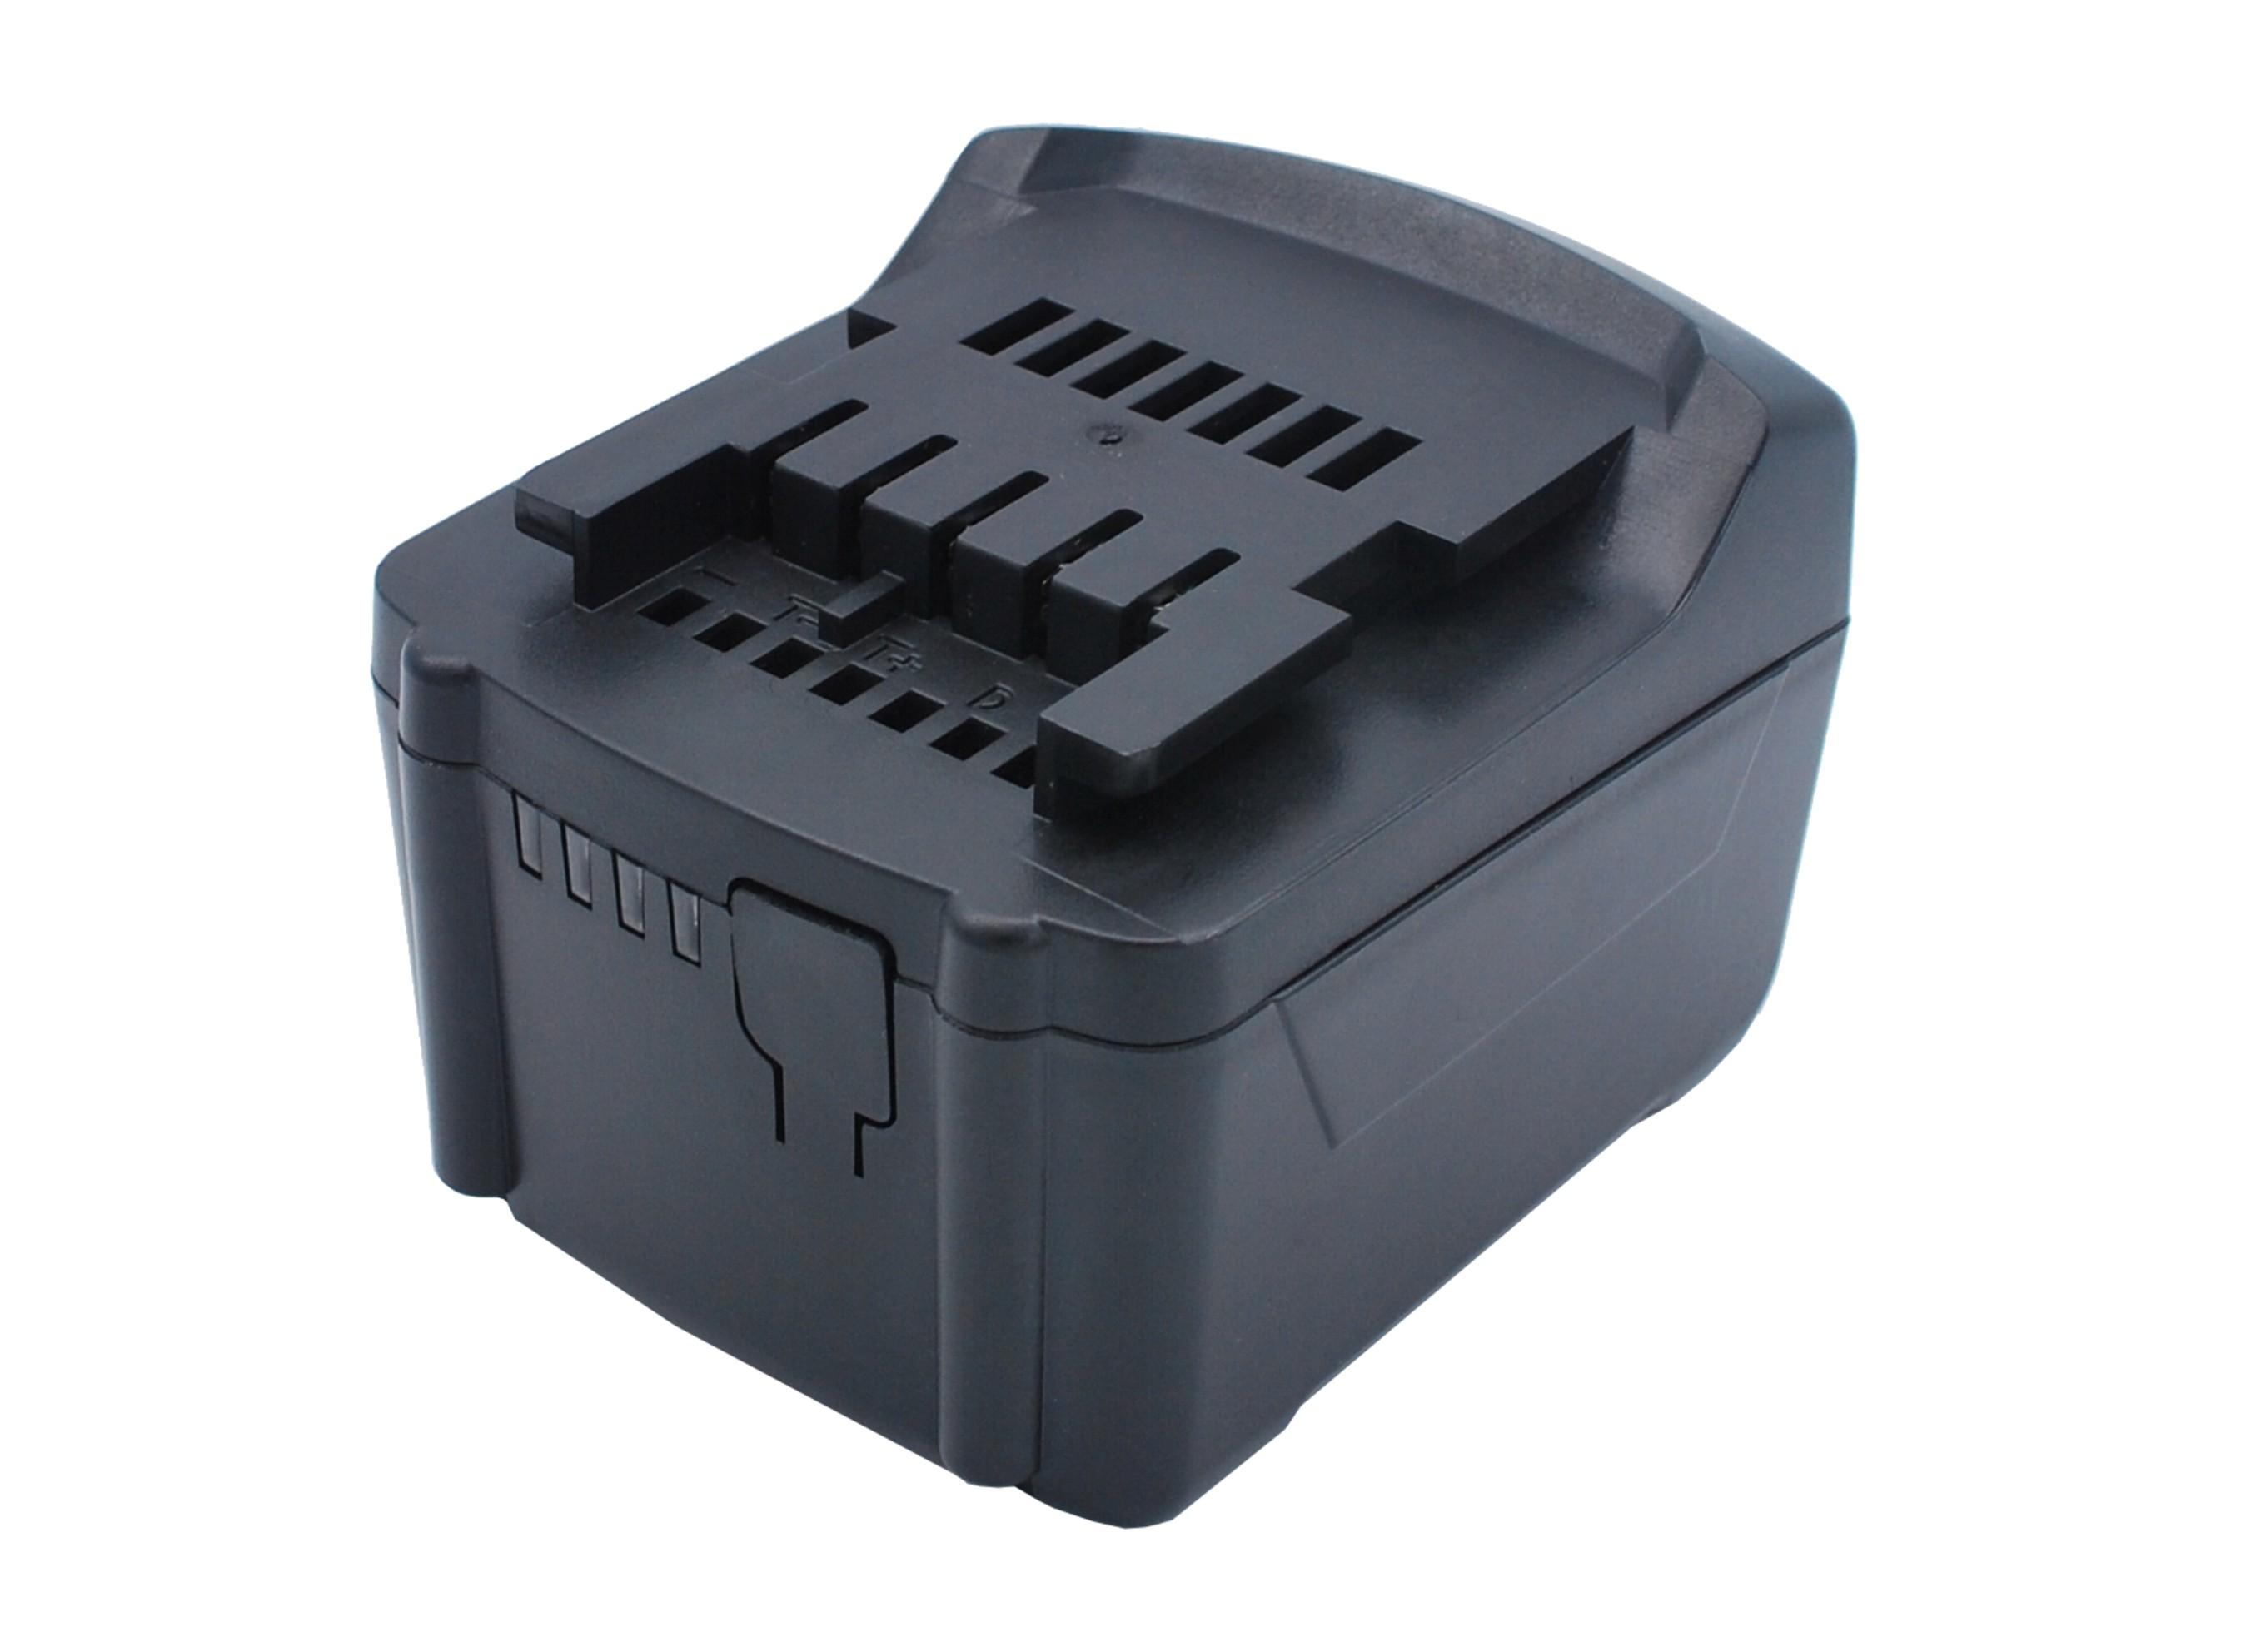 Cameron Sino baterie do nářadí pro METABO BS 14.4 LT Compact 6.02137.55 14.4V Li-ion 5000mAh černá - neoriginální